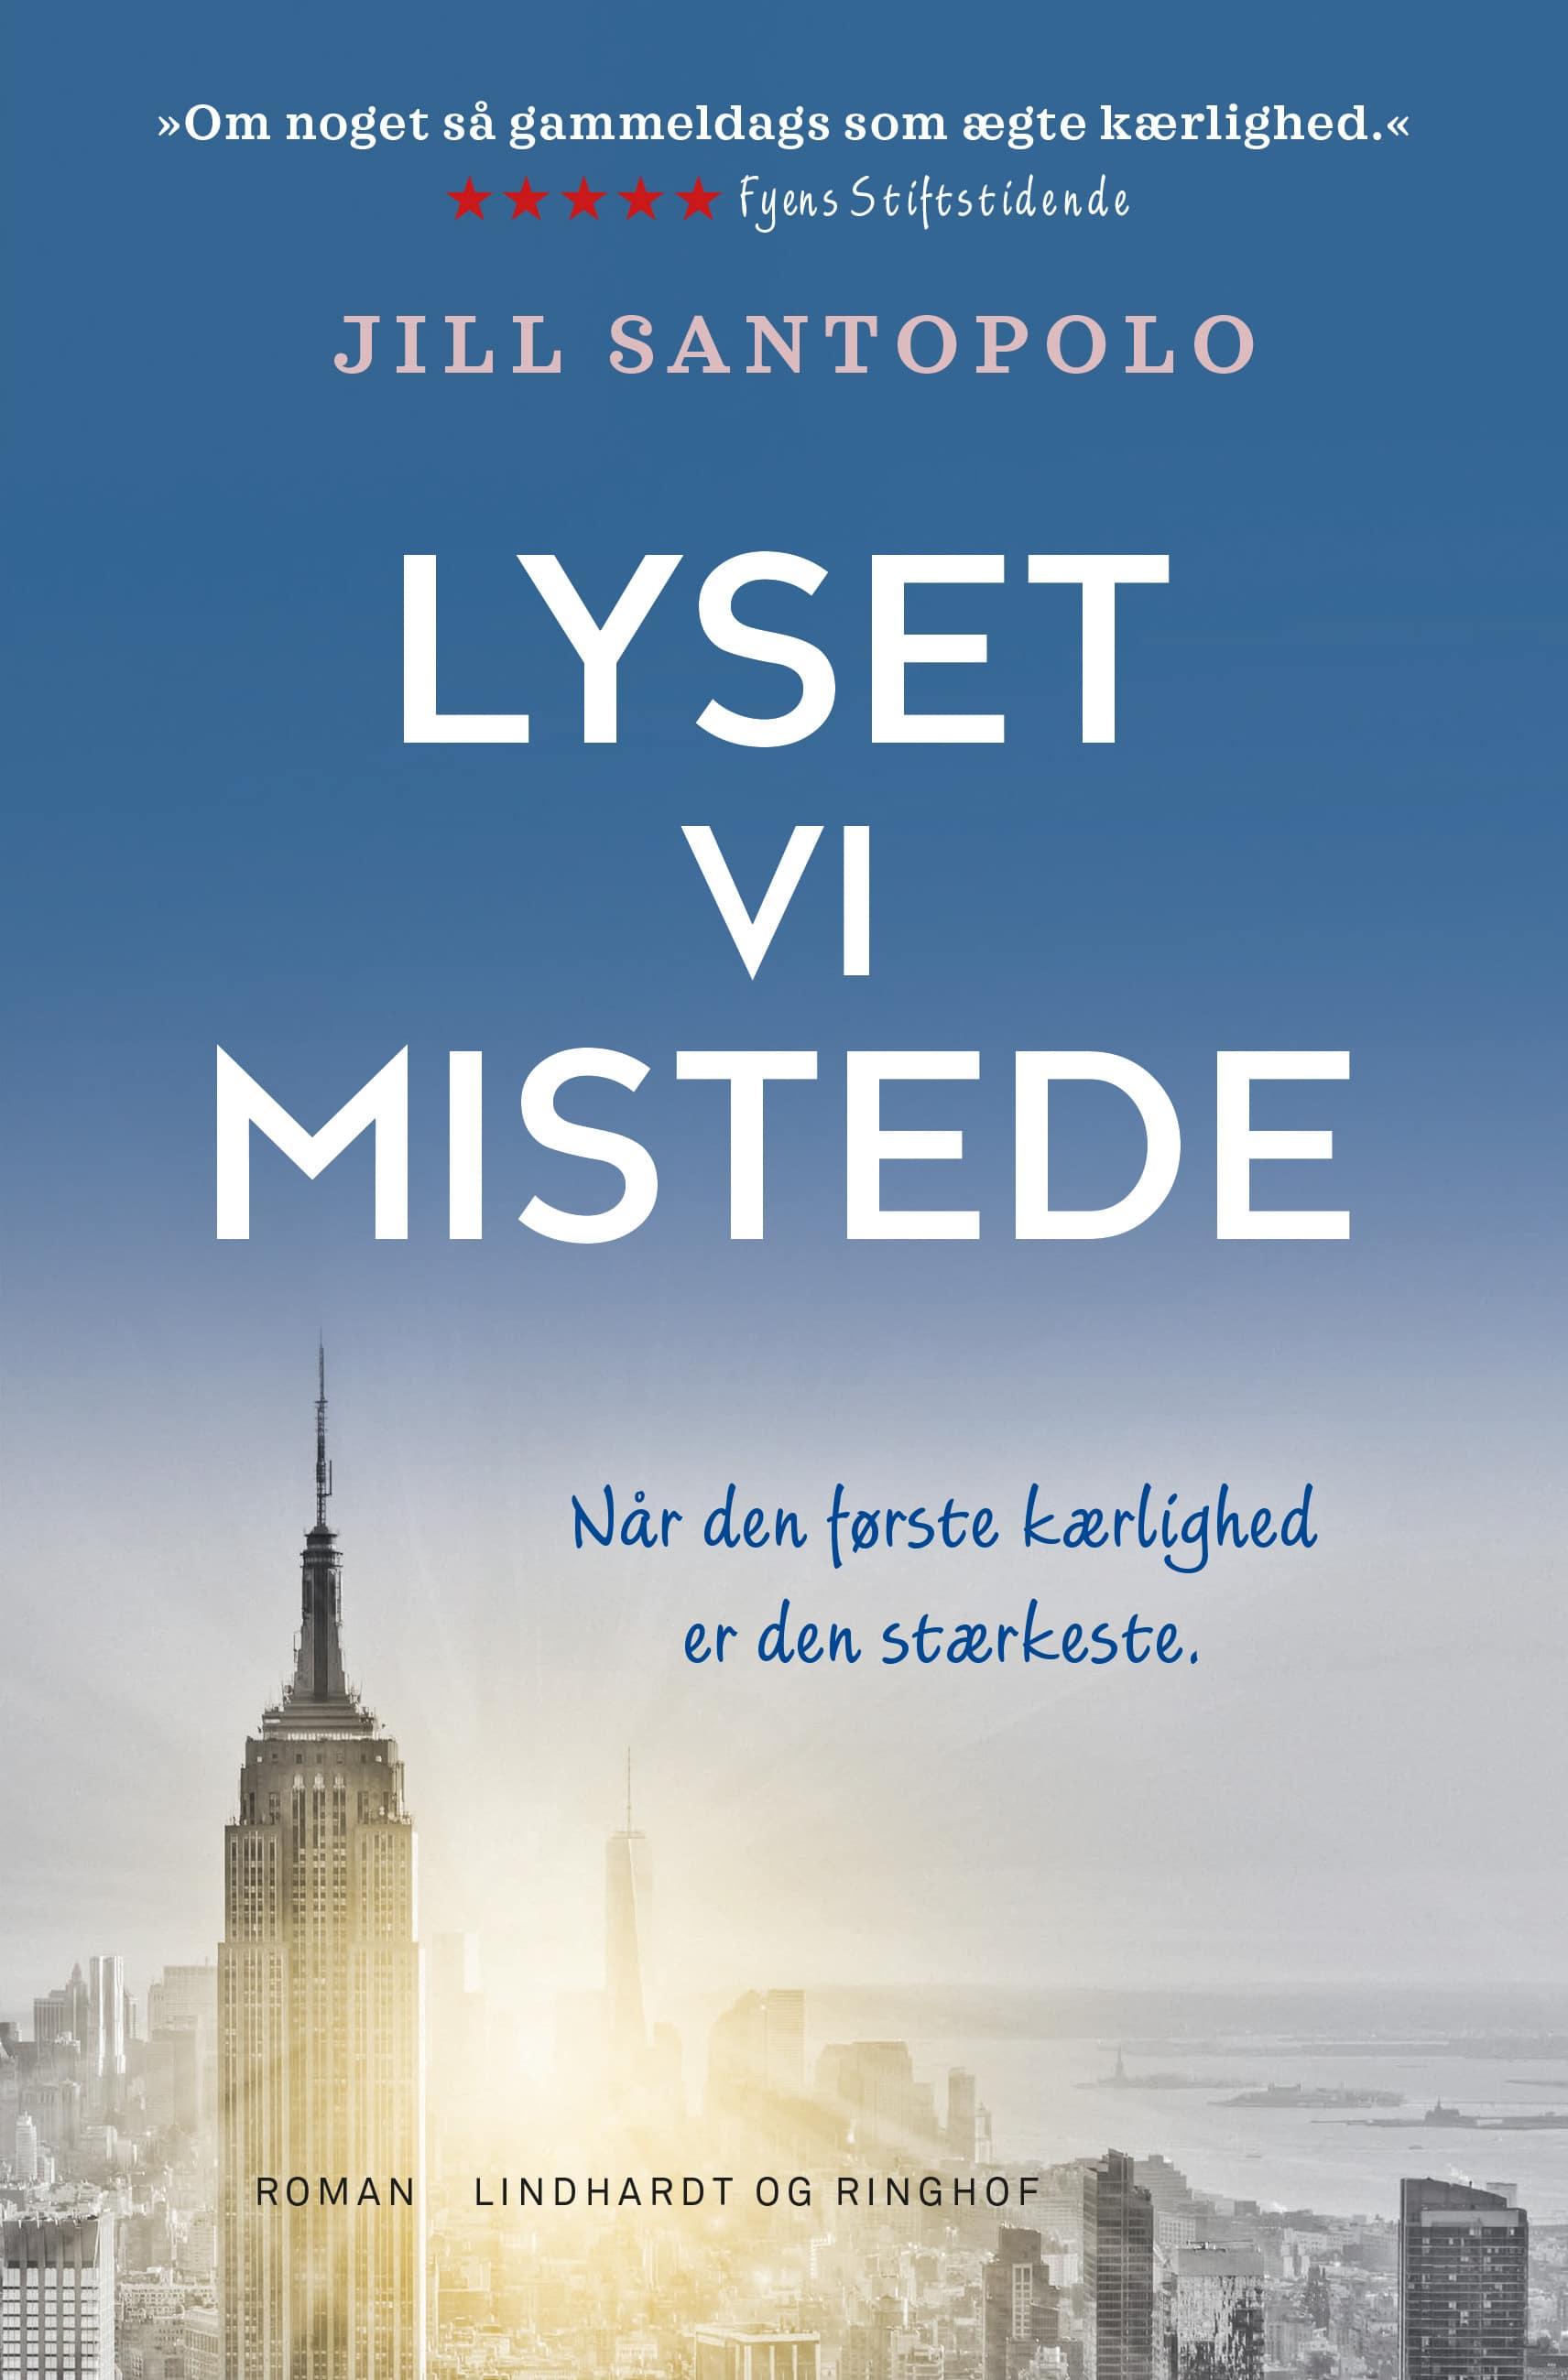 Lyset vi mistede, Jill Santopolo, kærlighedsroman, kærlighedsromaner, romance,